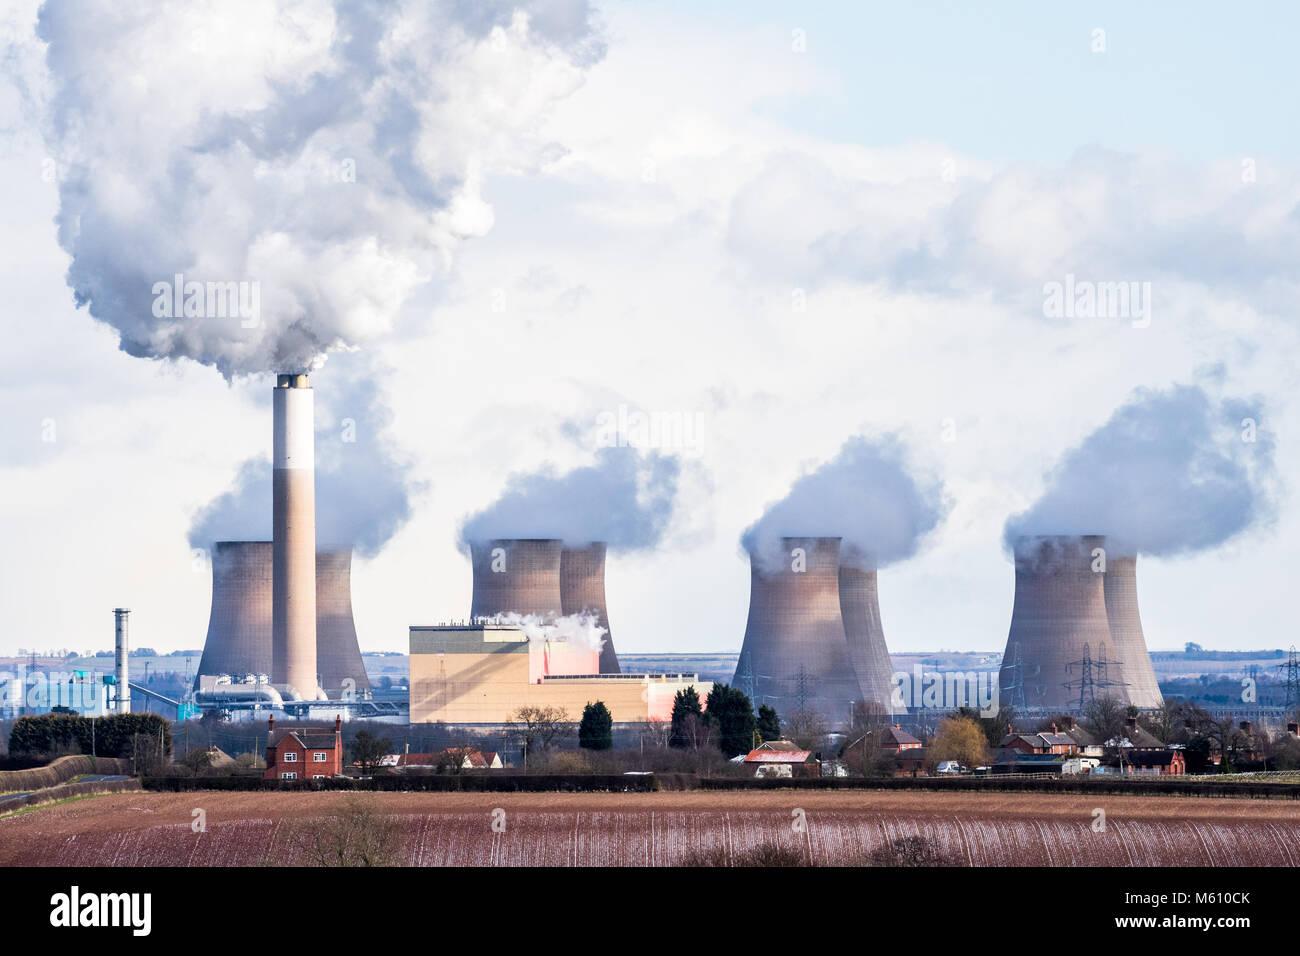 Cottam, Retford, Nottinghamshire, UK. 27th. February 2018. Cottam coal fired power station in Nottinghamshire working - Stock Image